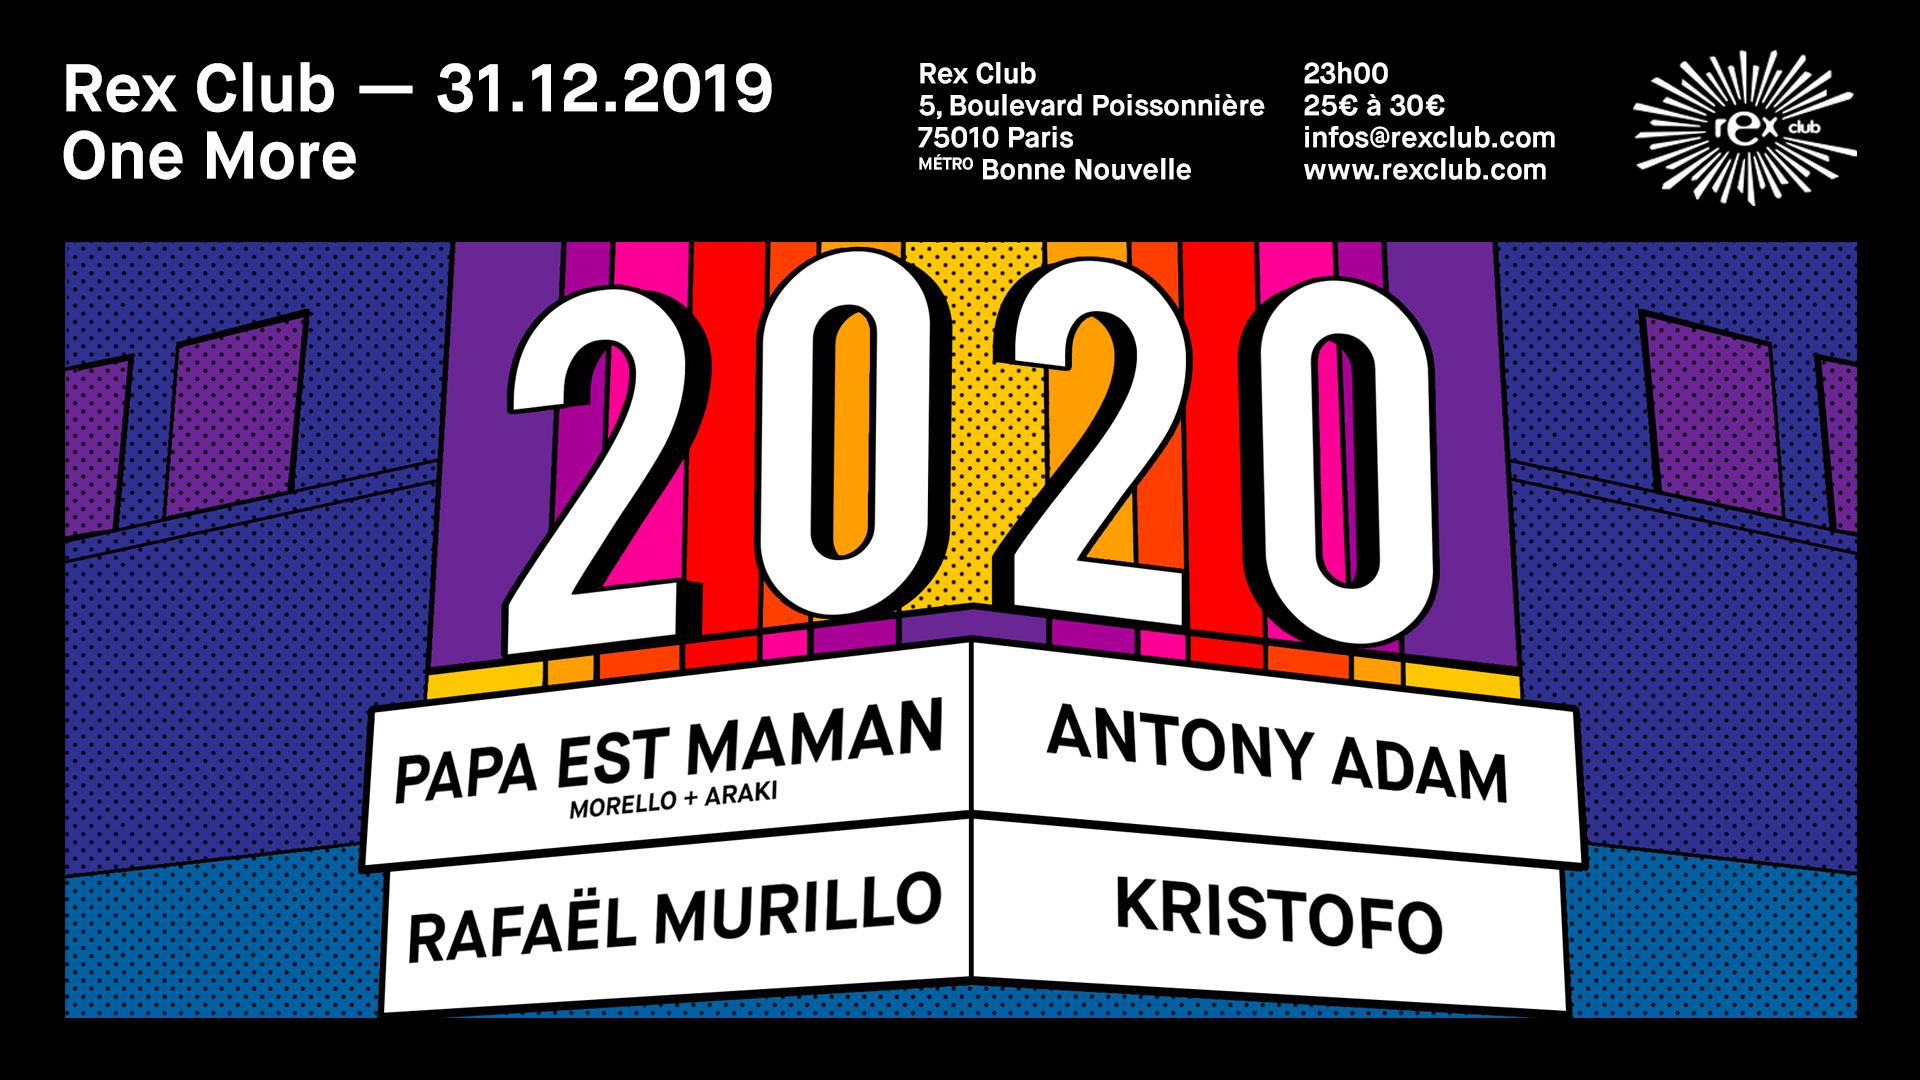 One More: Kristofo, Antony Adam, Rafaël Murillo, Papa est Maman